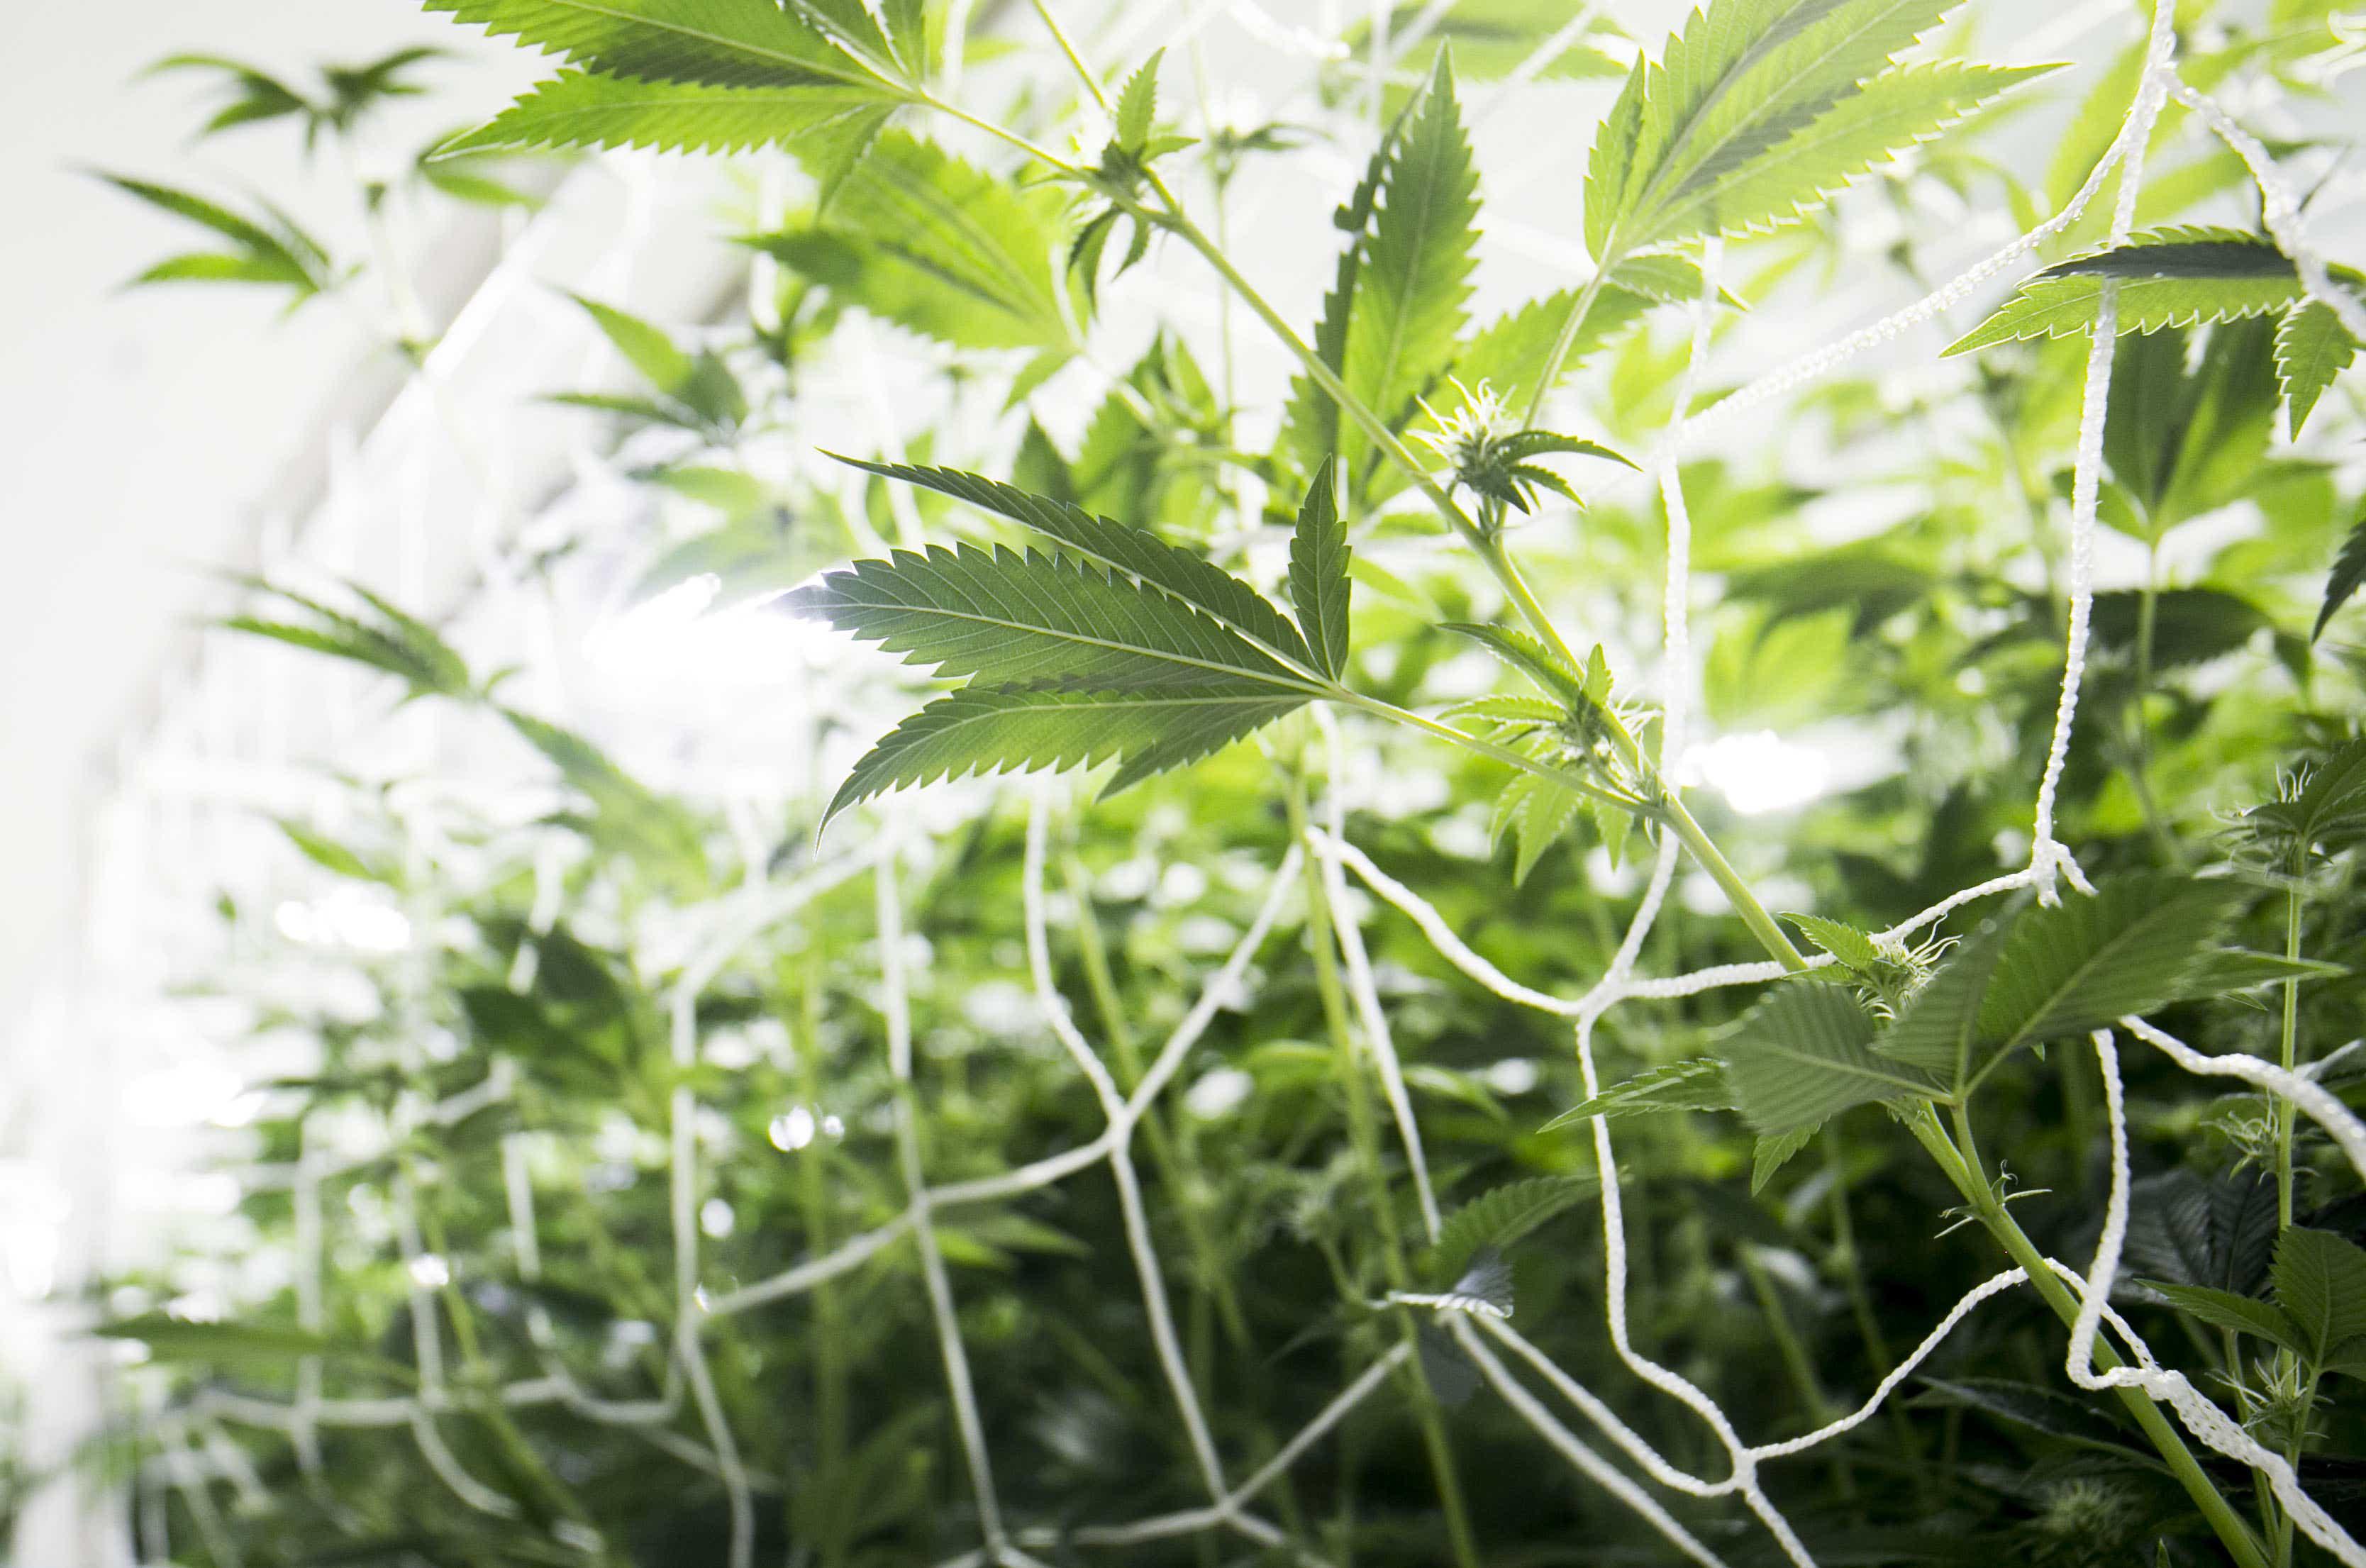 Phoenix neighbors sue volunteer city board over medical marijuana dispensary